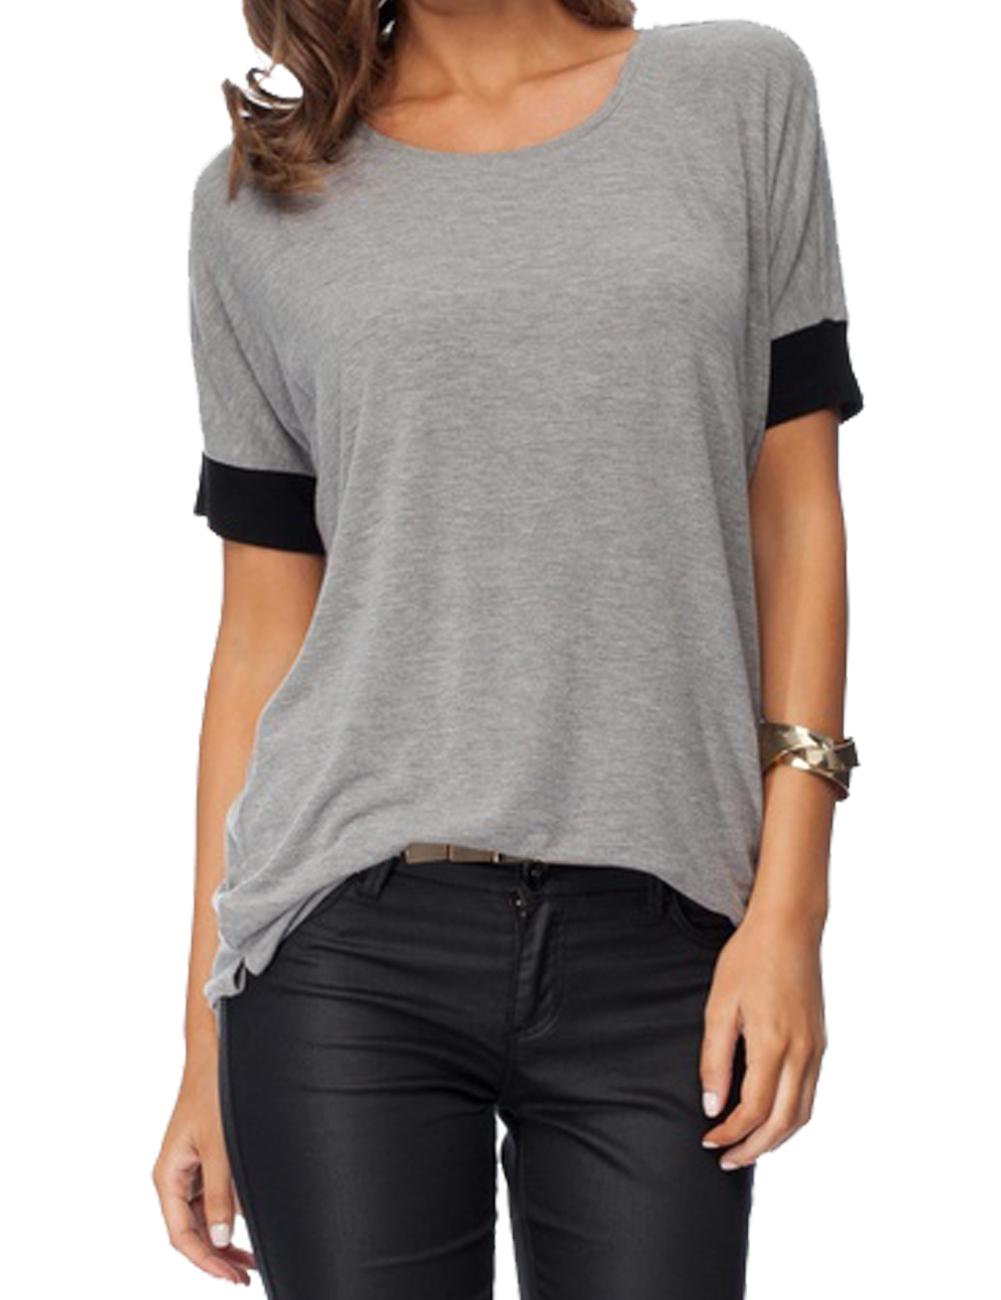 Imixcity Women's Casual Round Collar Short Sleeve T-Shirt Blouse Tops